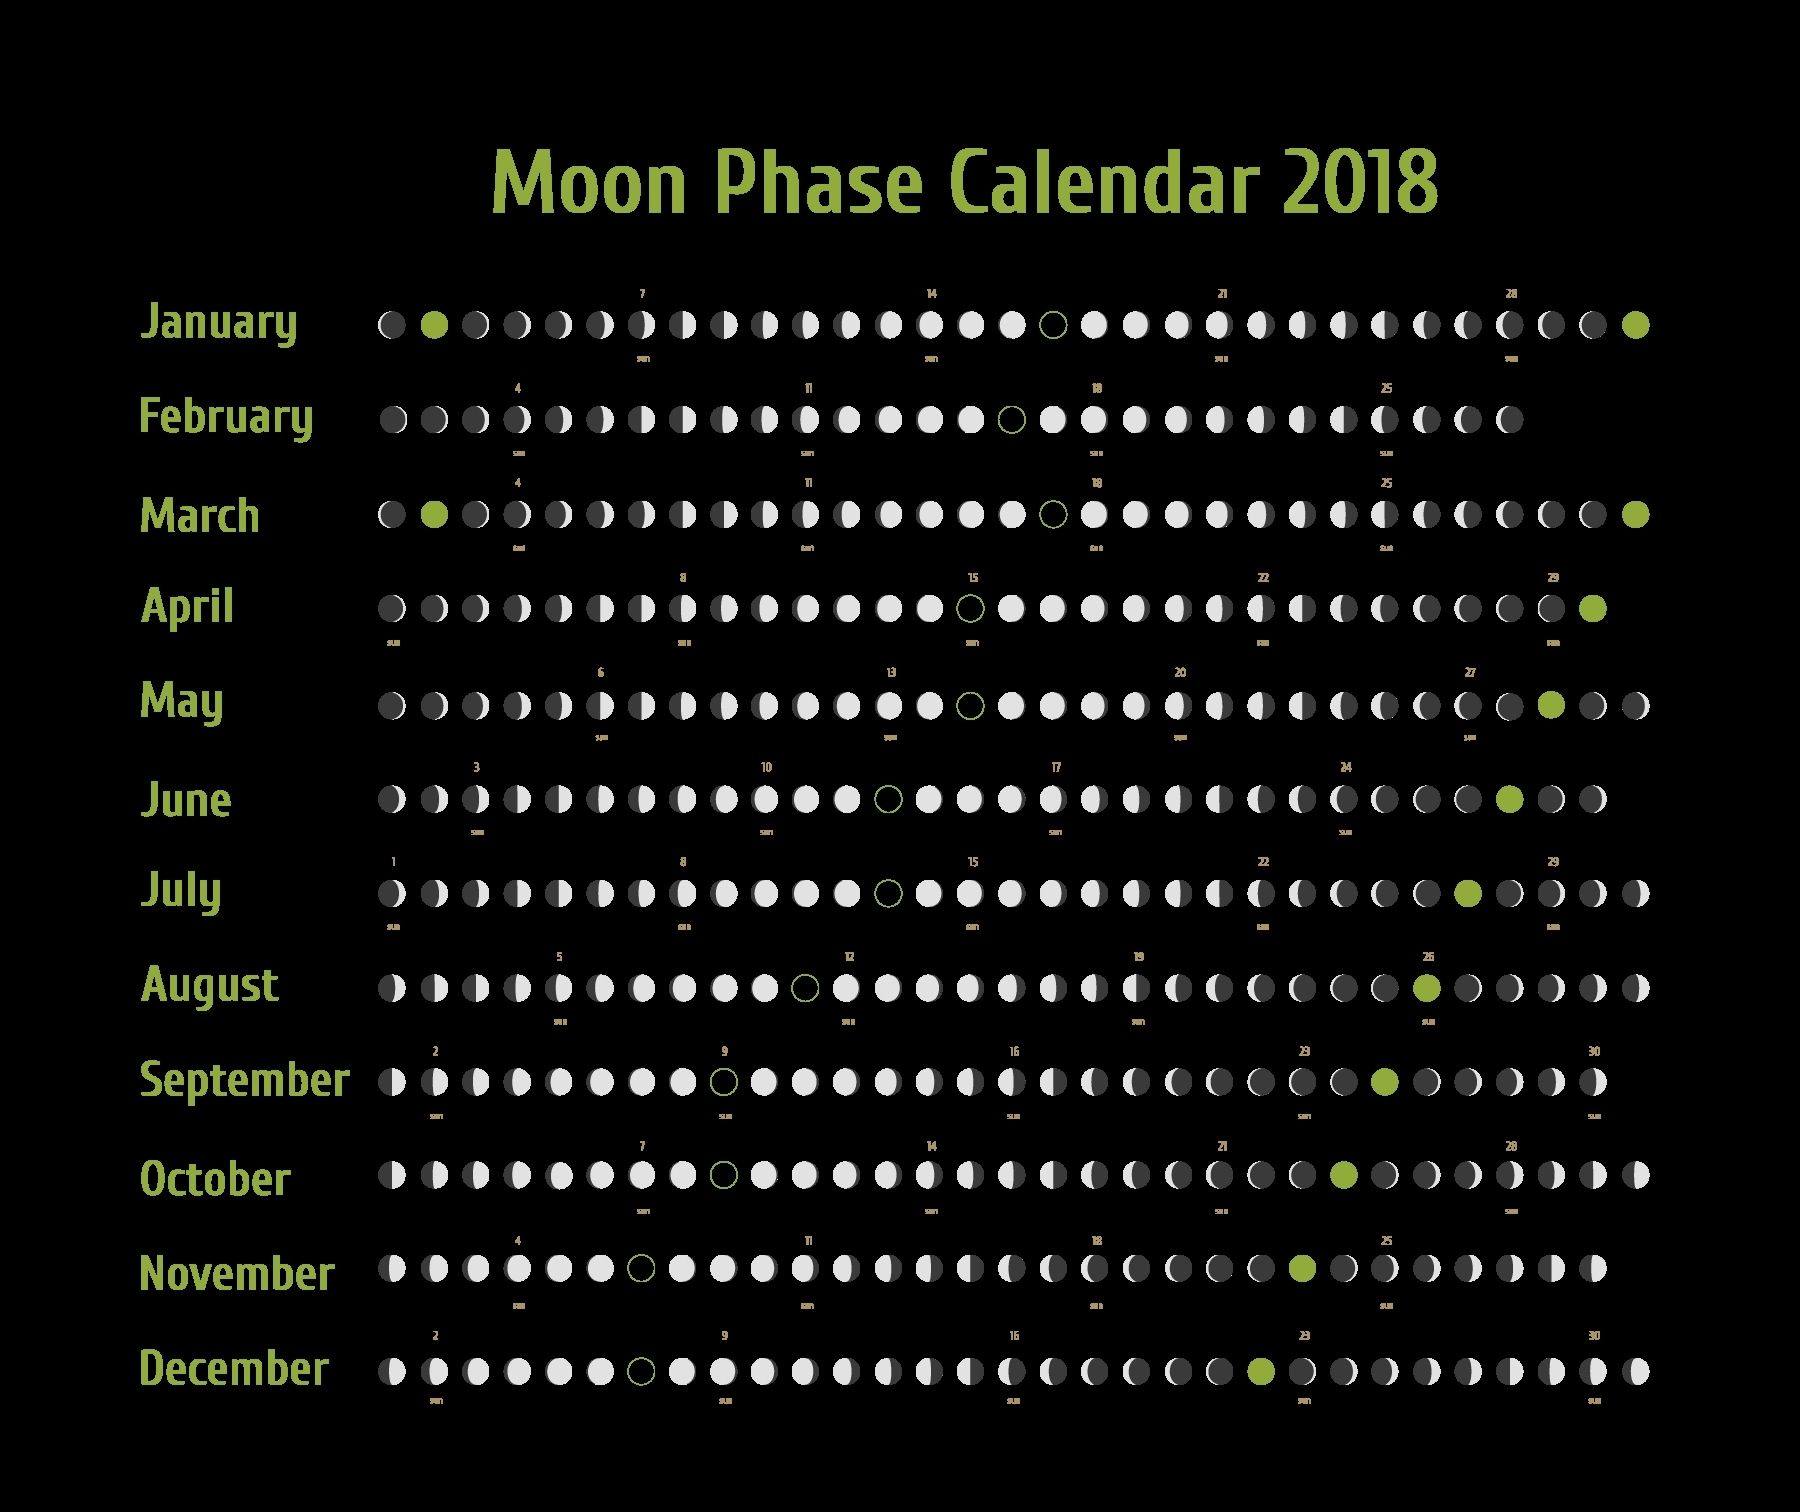 Moon Phase Calendar April